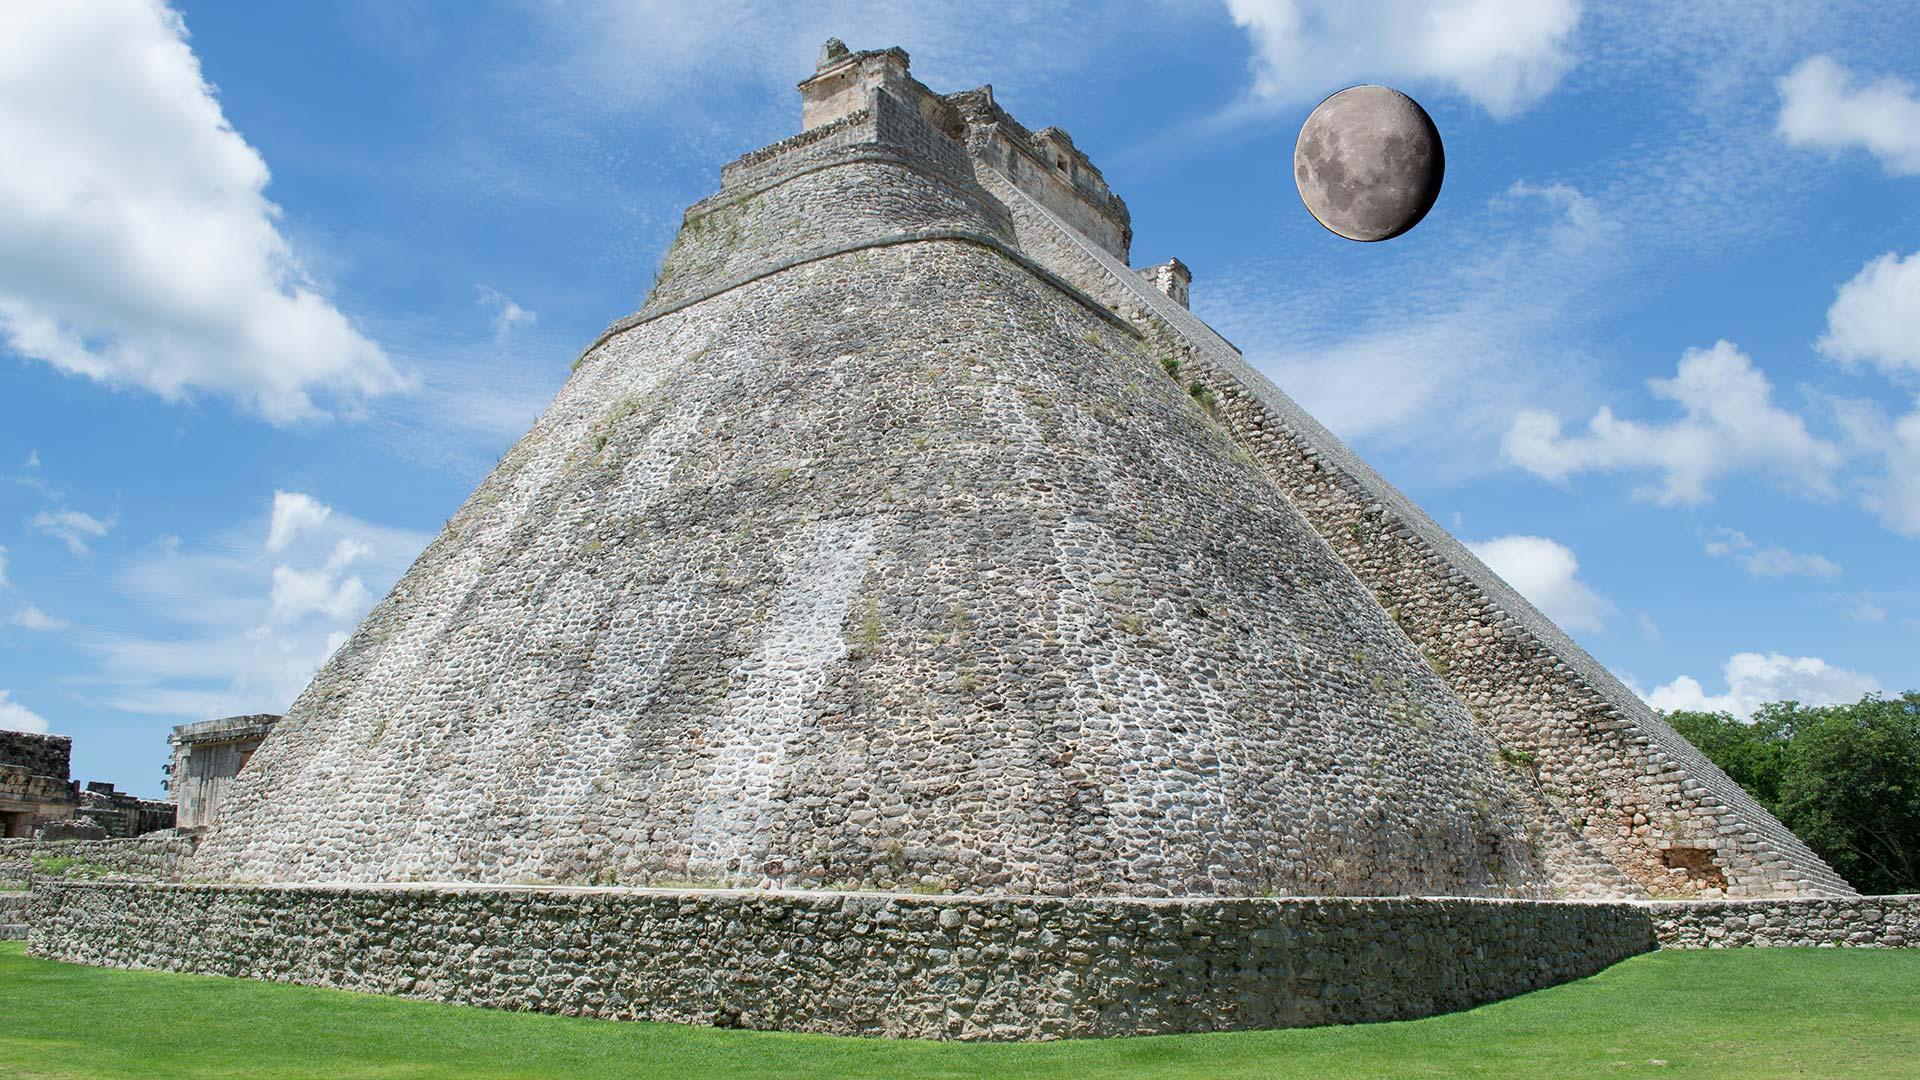 Pirâmide do Adivinho, Uxmal, Mexico